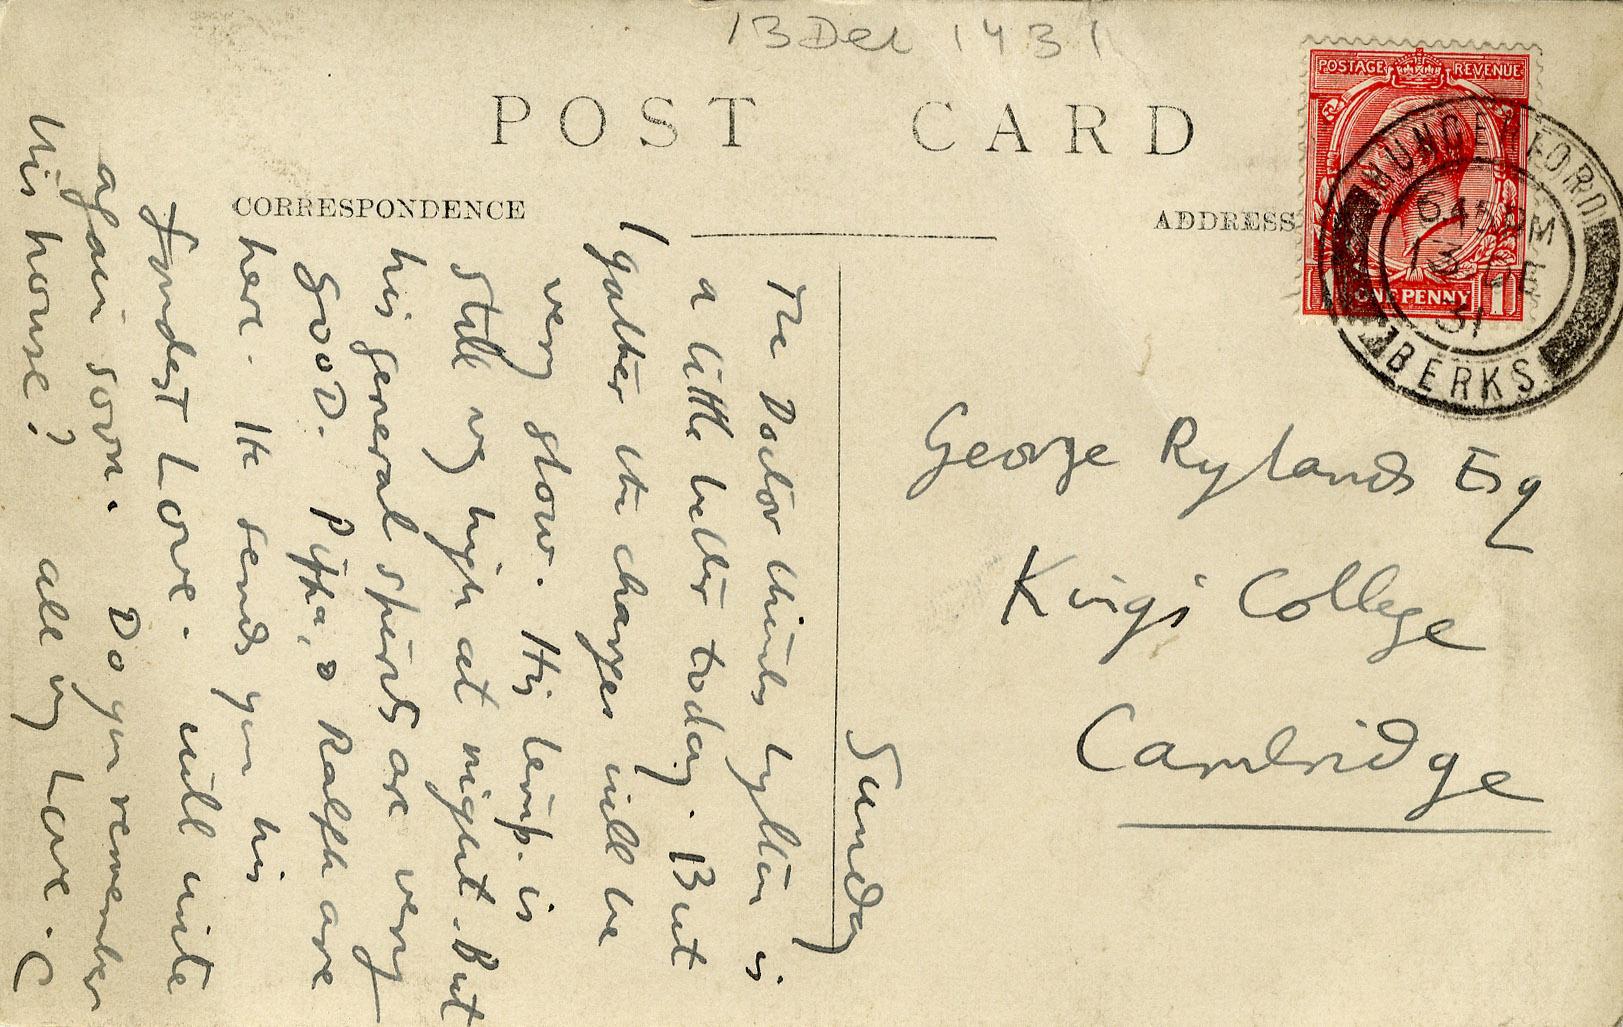 Postcard sent from Dora Carrington to Dadie Rylands, dated Sunday, postmarked 13 December 1931. (GHWR/3/81)